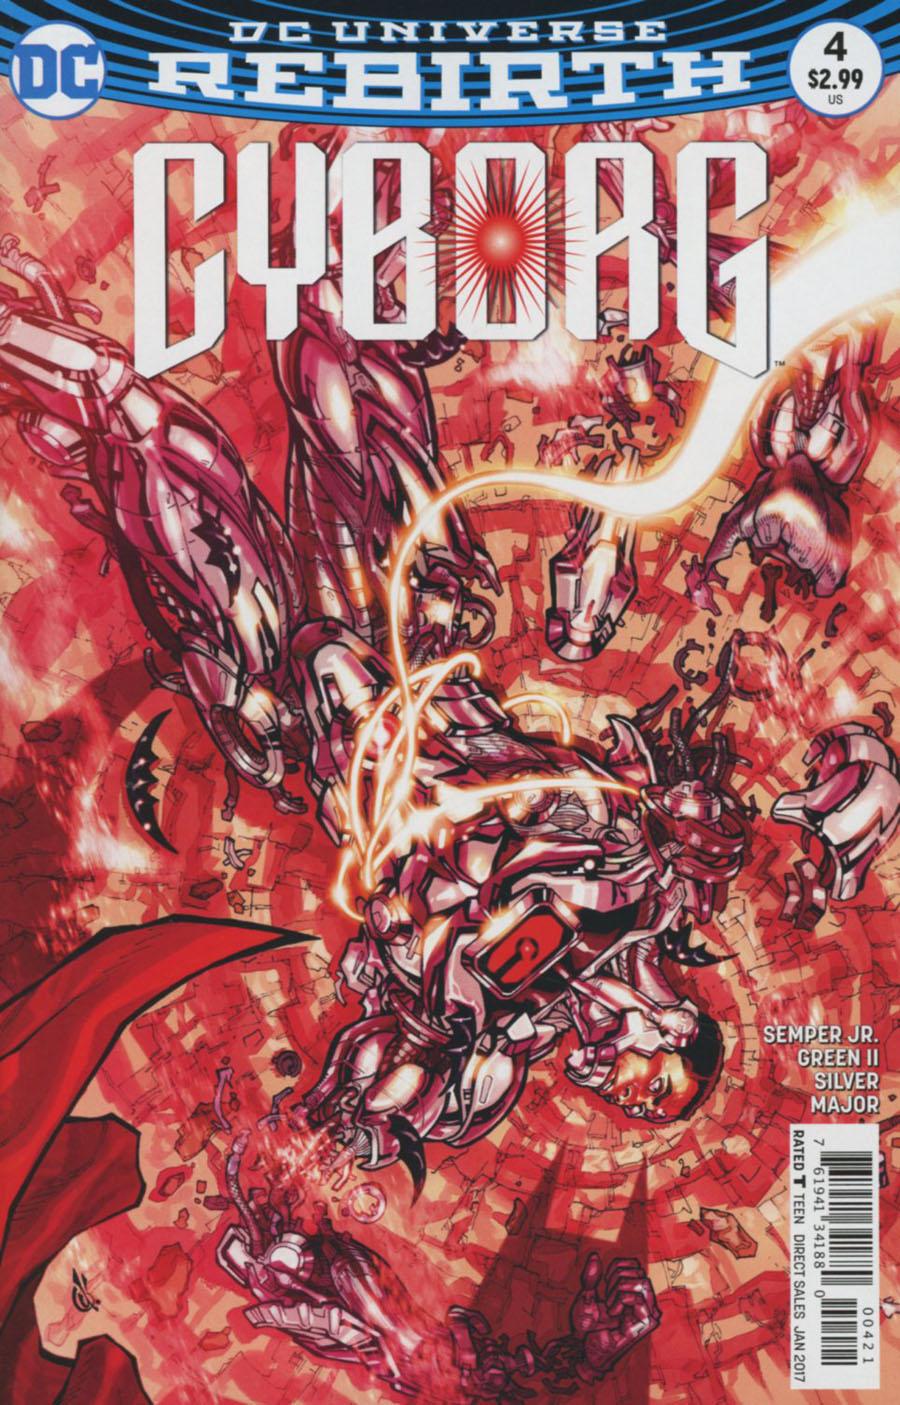 Cyborg Vol 2 #4 Cover B Variant Carlos DAnda Cover